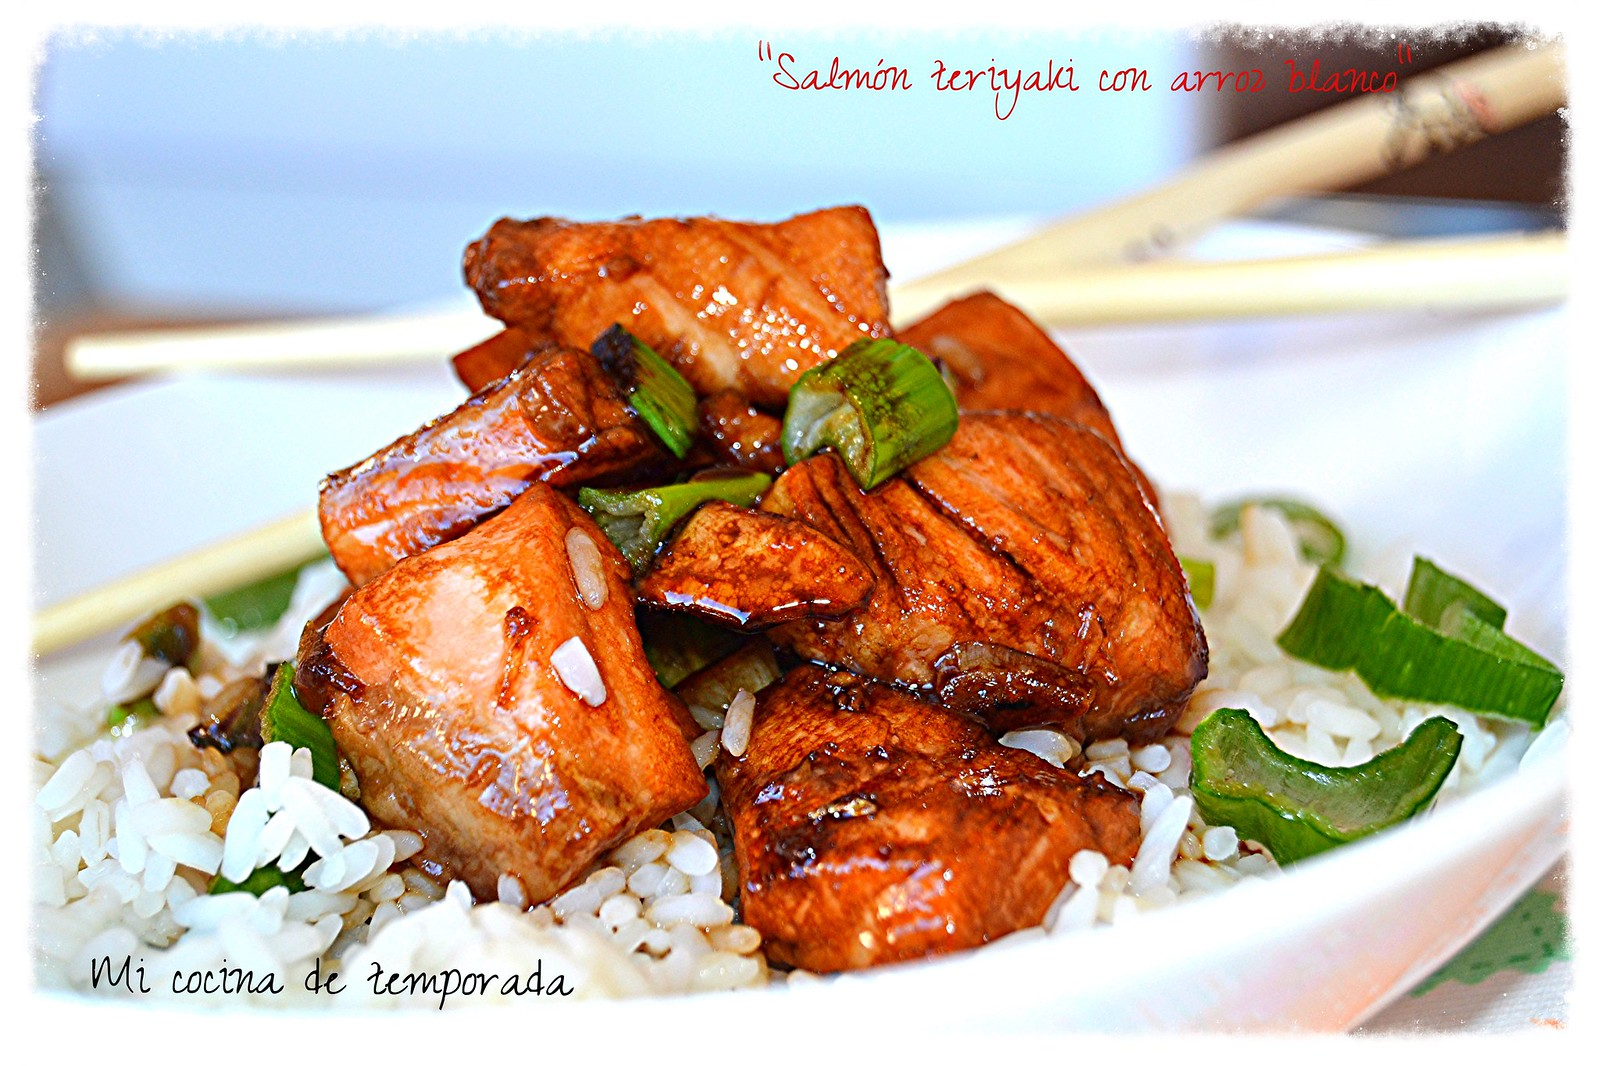 arroz con salmon al teriyaki 009